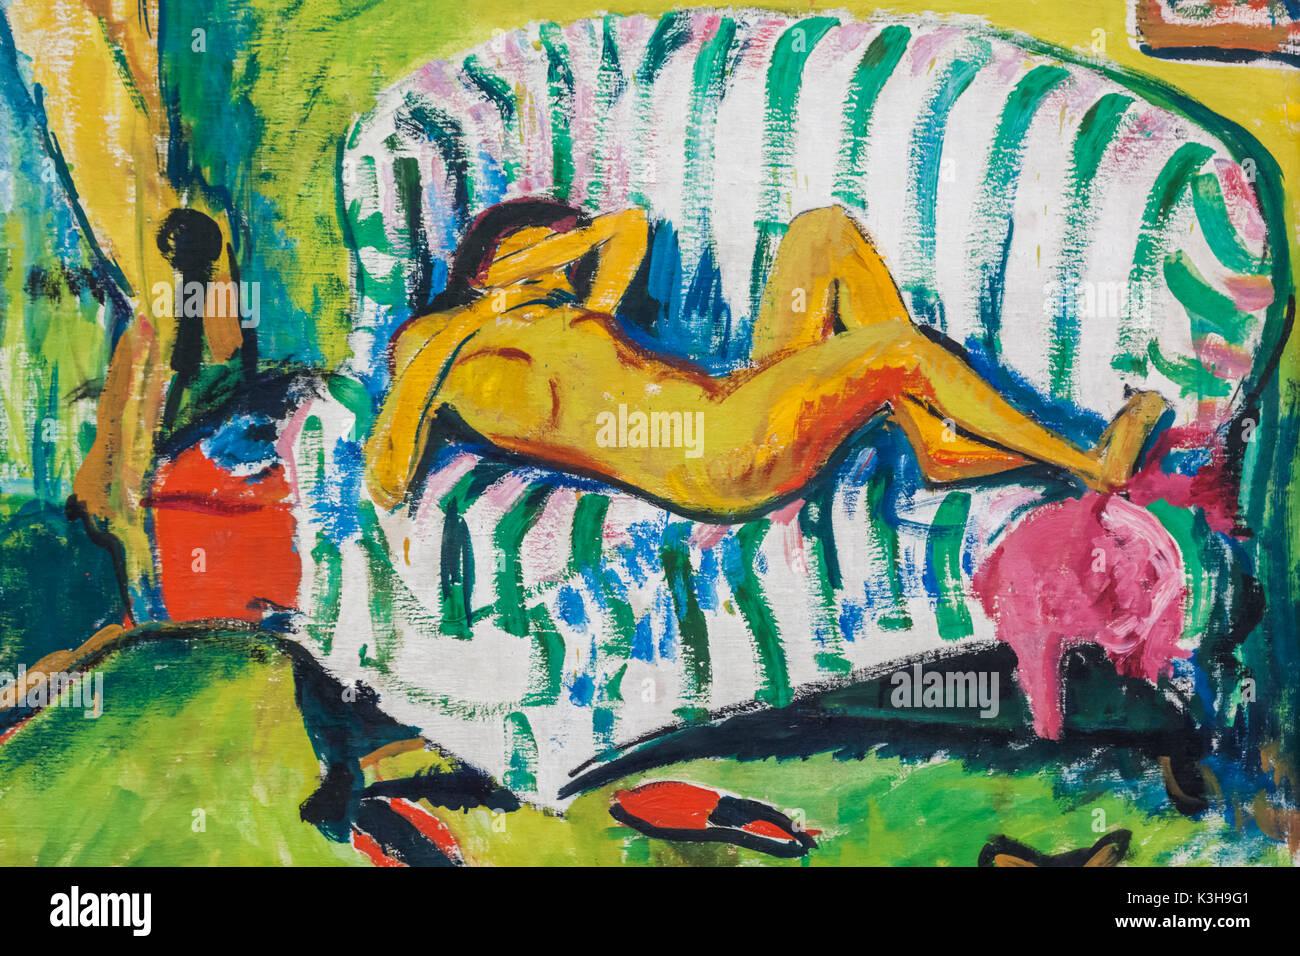 Germany, Bavaria, Munich, The Pinakothek Museum of Modern Art (Pinakothek der Moderne), Painting titled 'Liegendes Madchen' by Erich Heckel dated 1909 - Stock Image